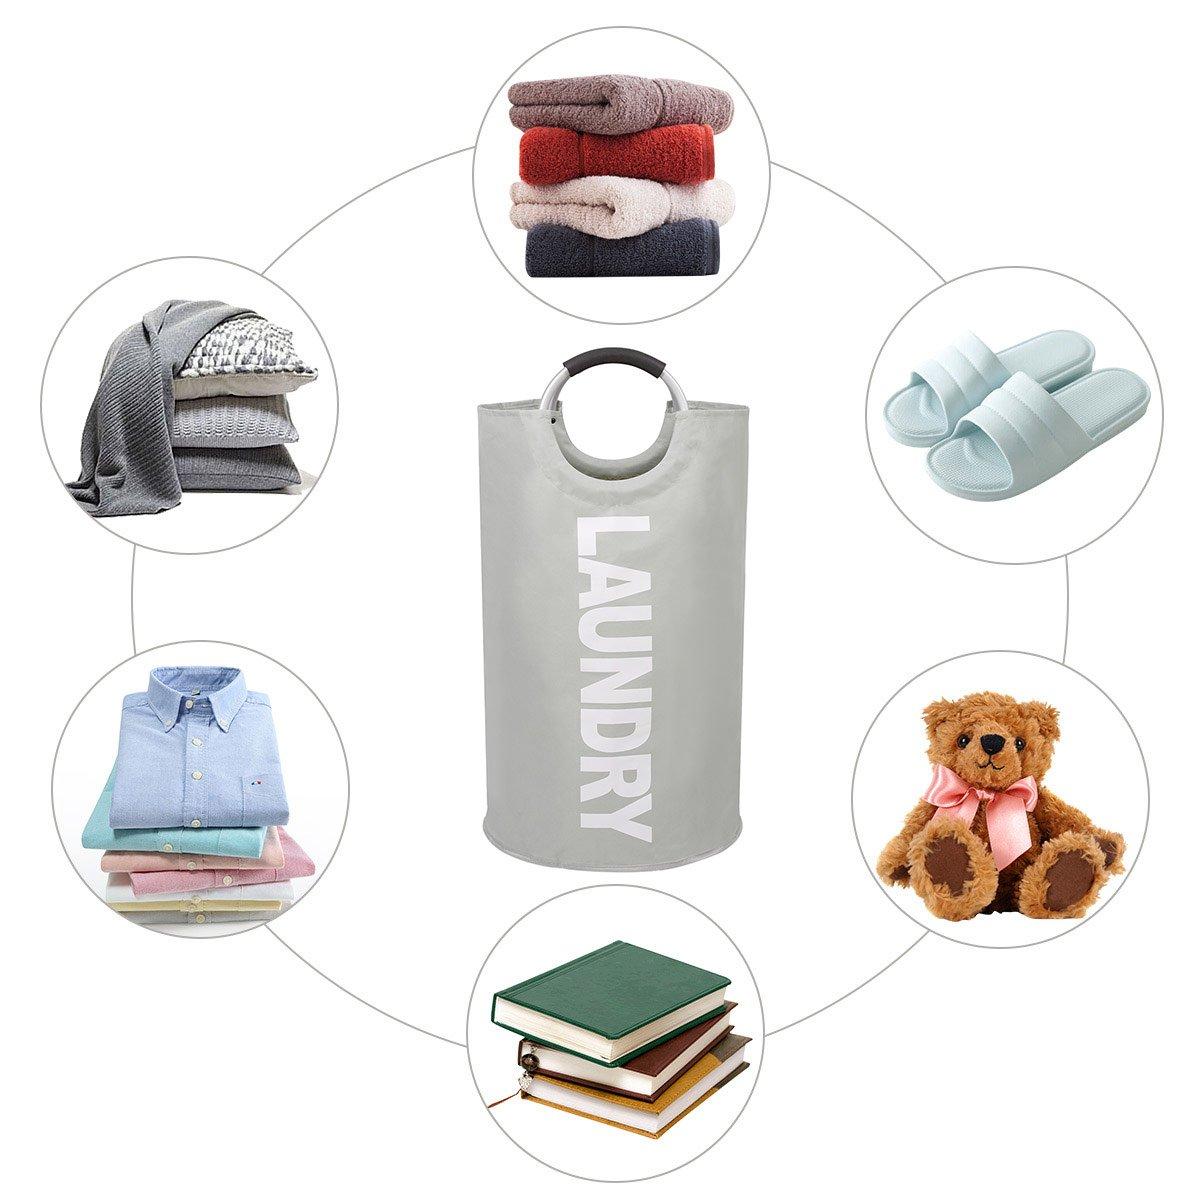 chrislley cesta para la ropa sucia (Oxford grande papelera plegable bolsa para la colada plegable lienzo Holder